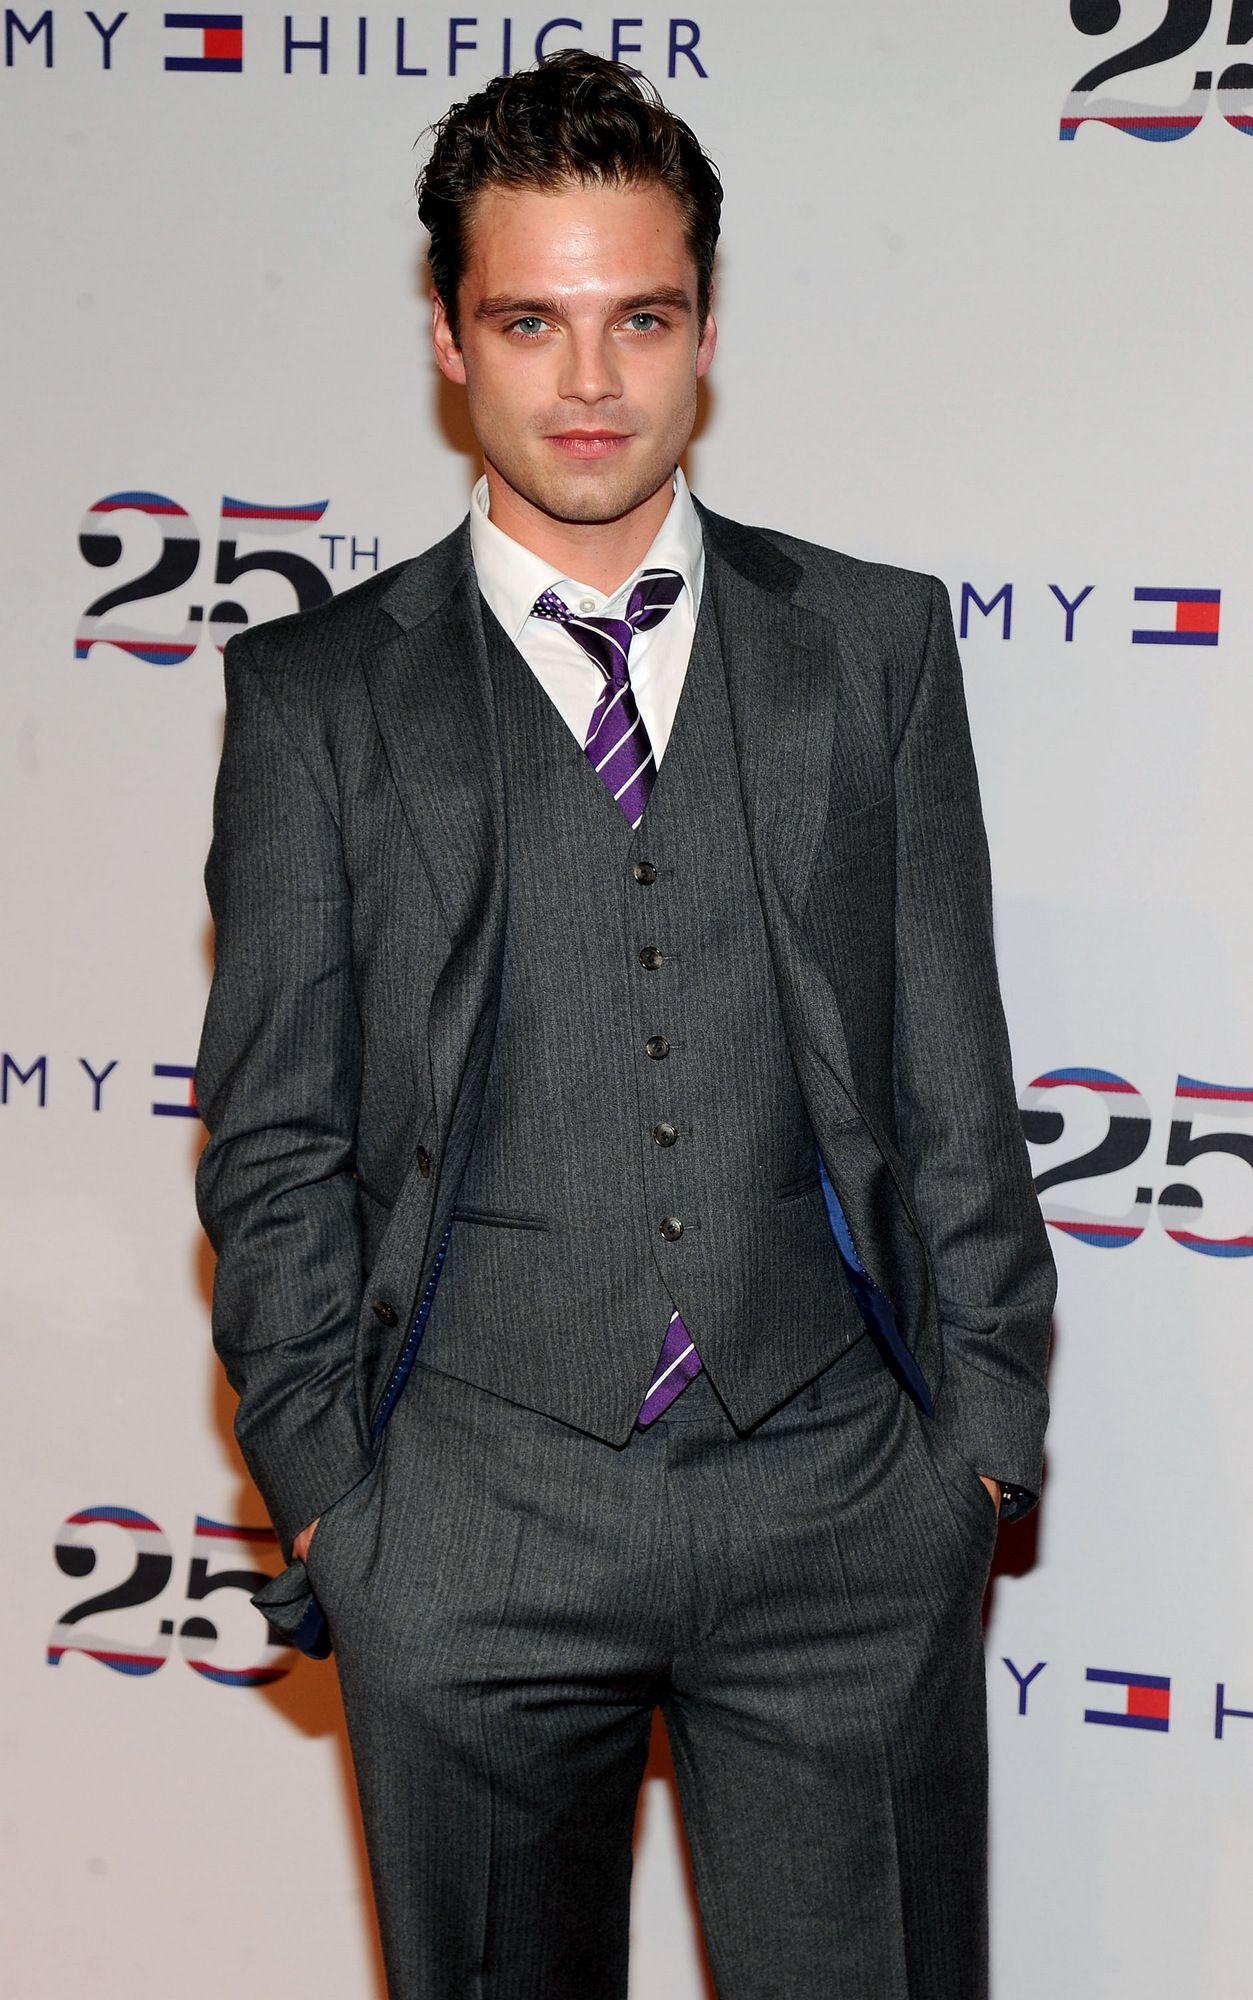 Assumere Fraintendere premuroso  Sebastian Stan | Sebastian stan, Purple suits, Hot suit